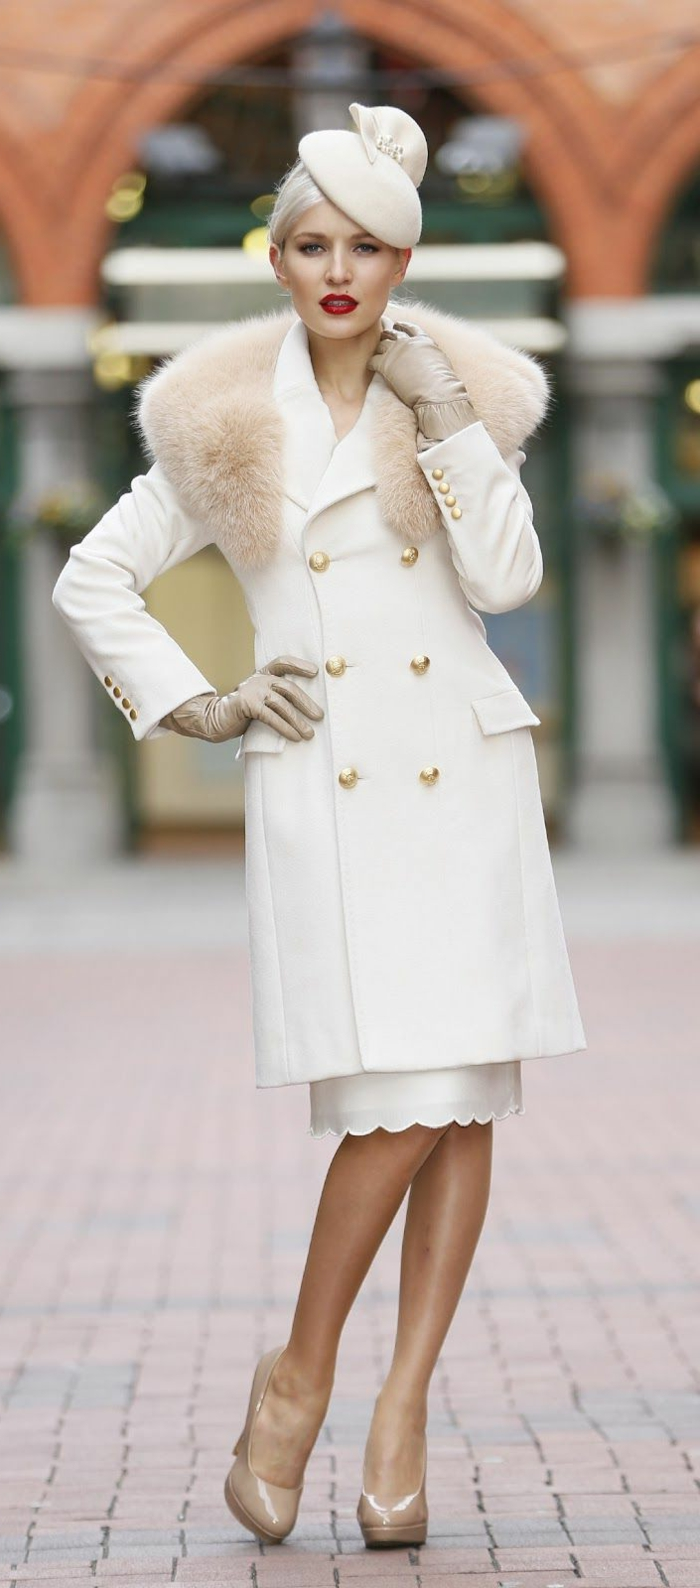 eleganter-Outfit-weiß-Mantel-goldene-Knöpfe-Rock-Schuhe-Körperfarbe